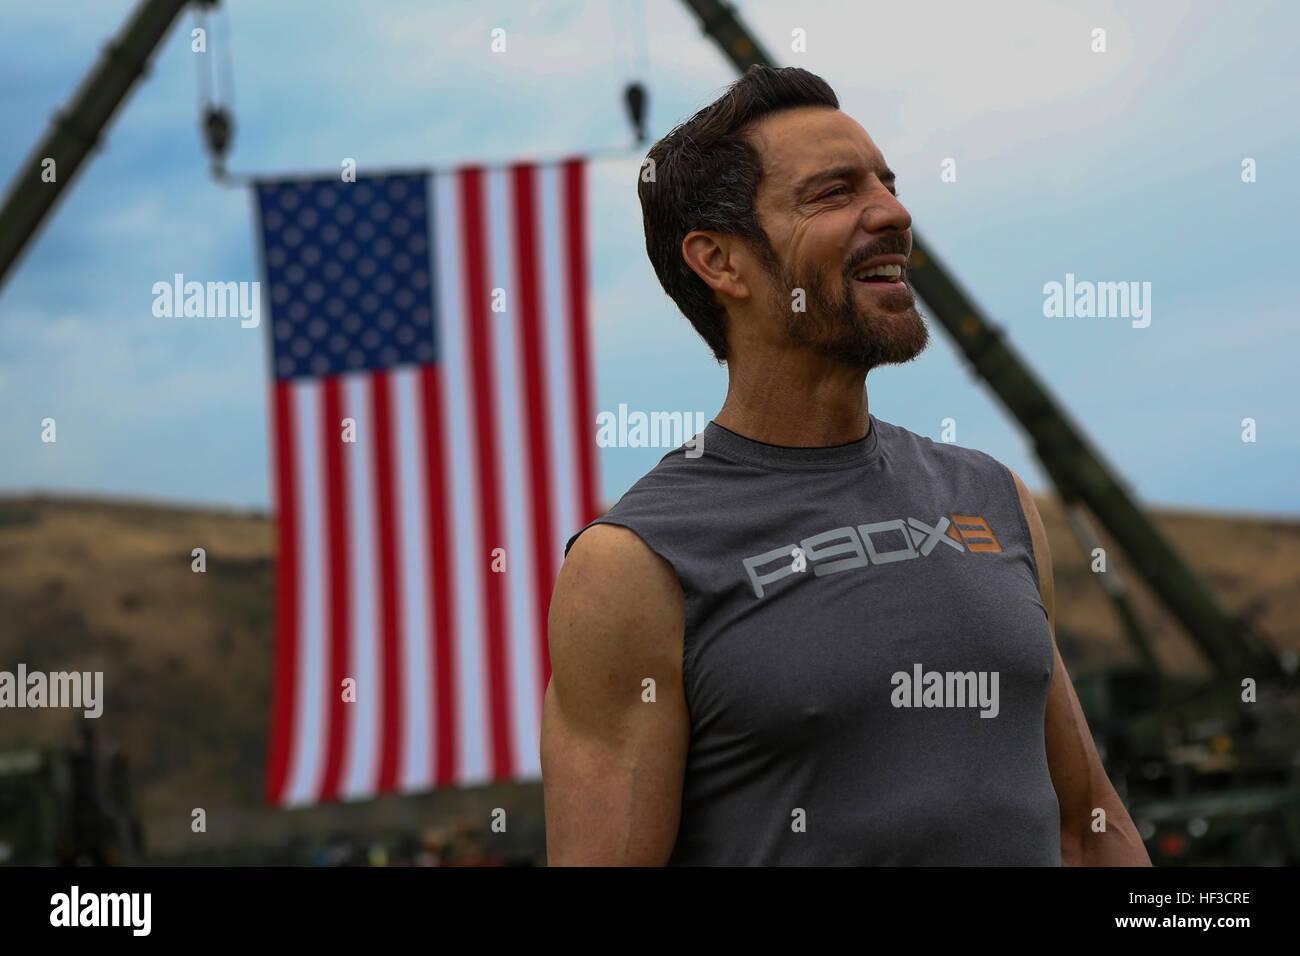 Tony Perkins Stockfotos & Tony Perkins Bilder - Alamy